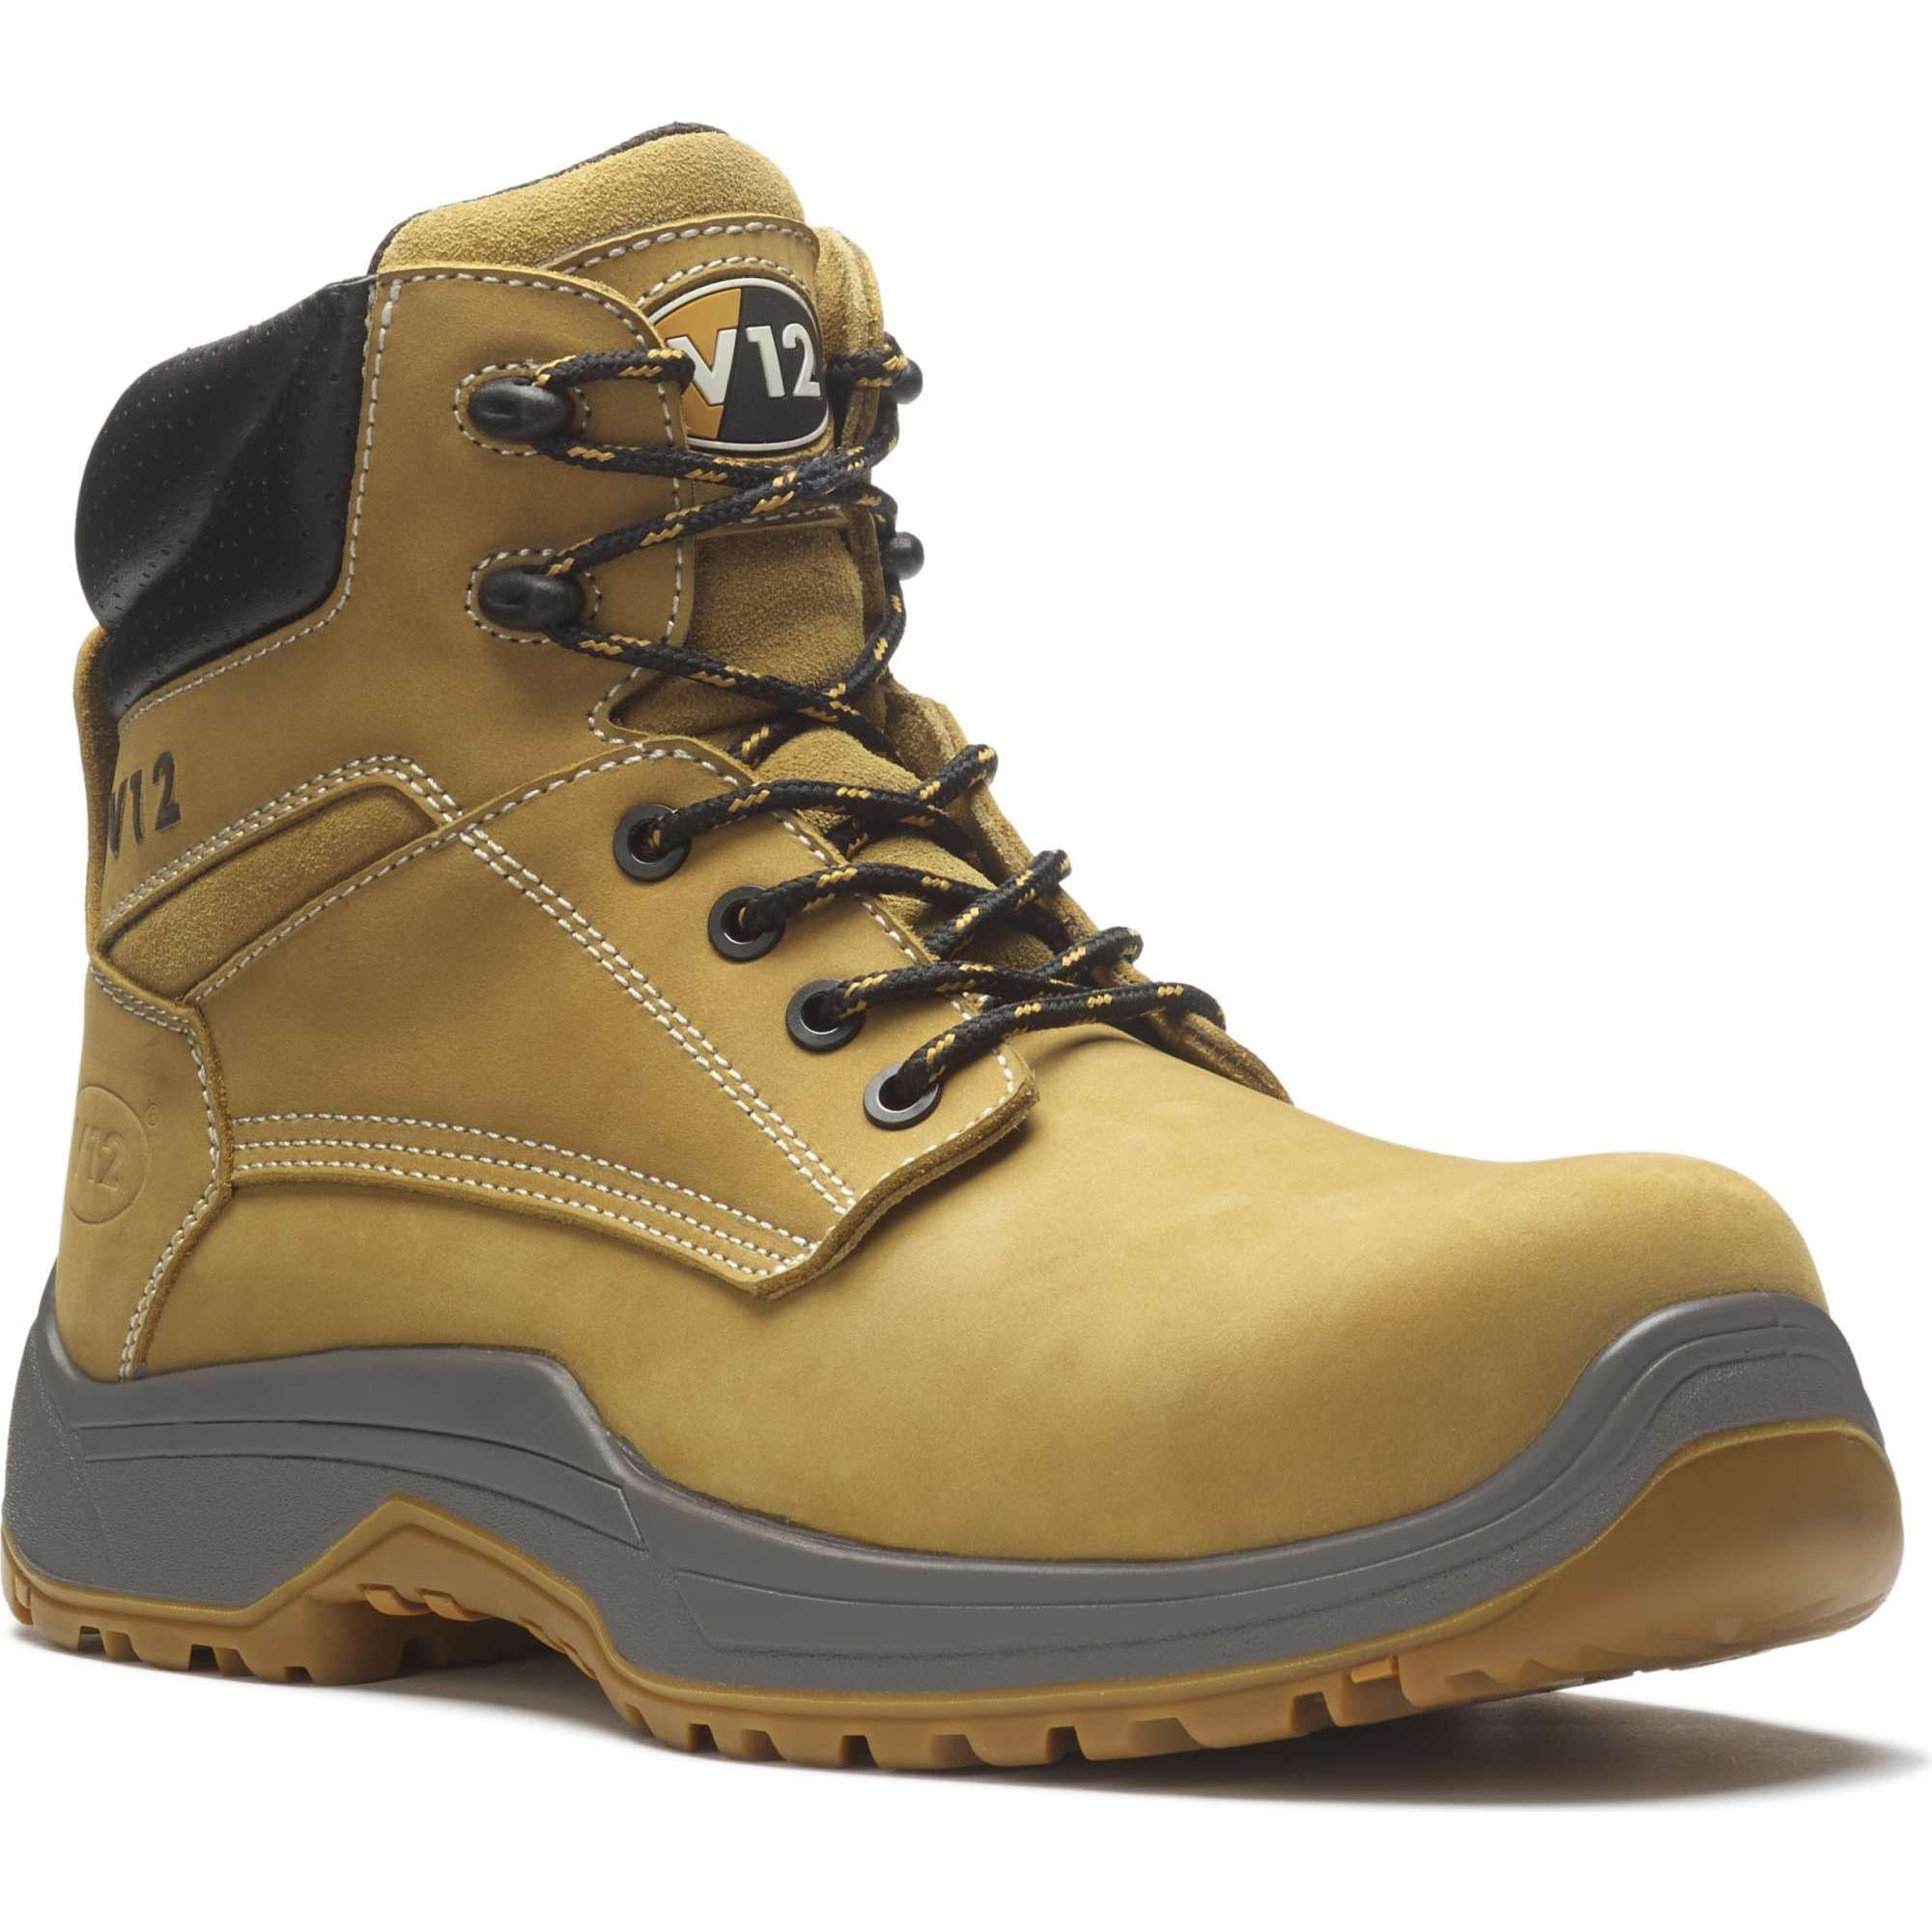 V12 Puma IGS Honey Nubuck Safety Boots